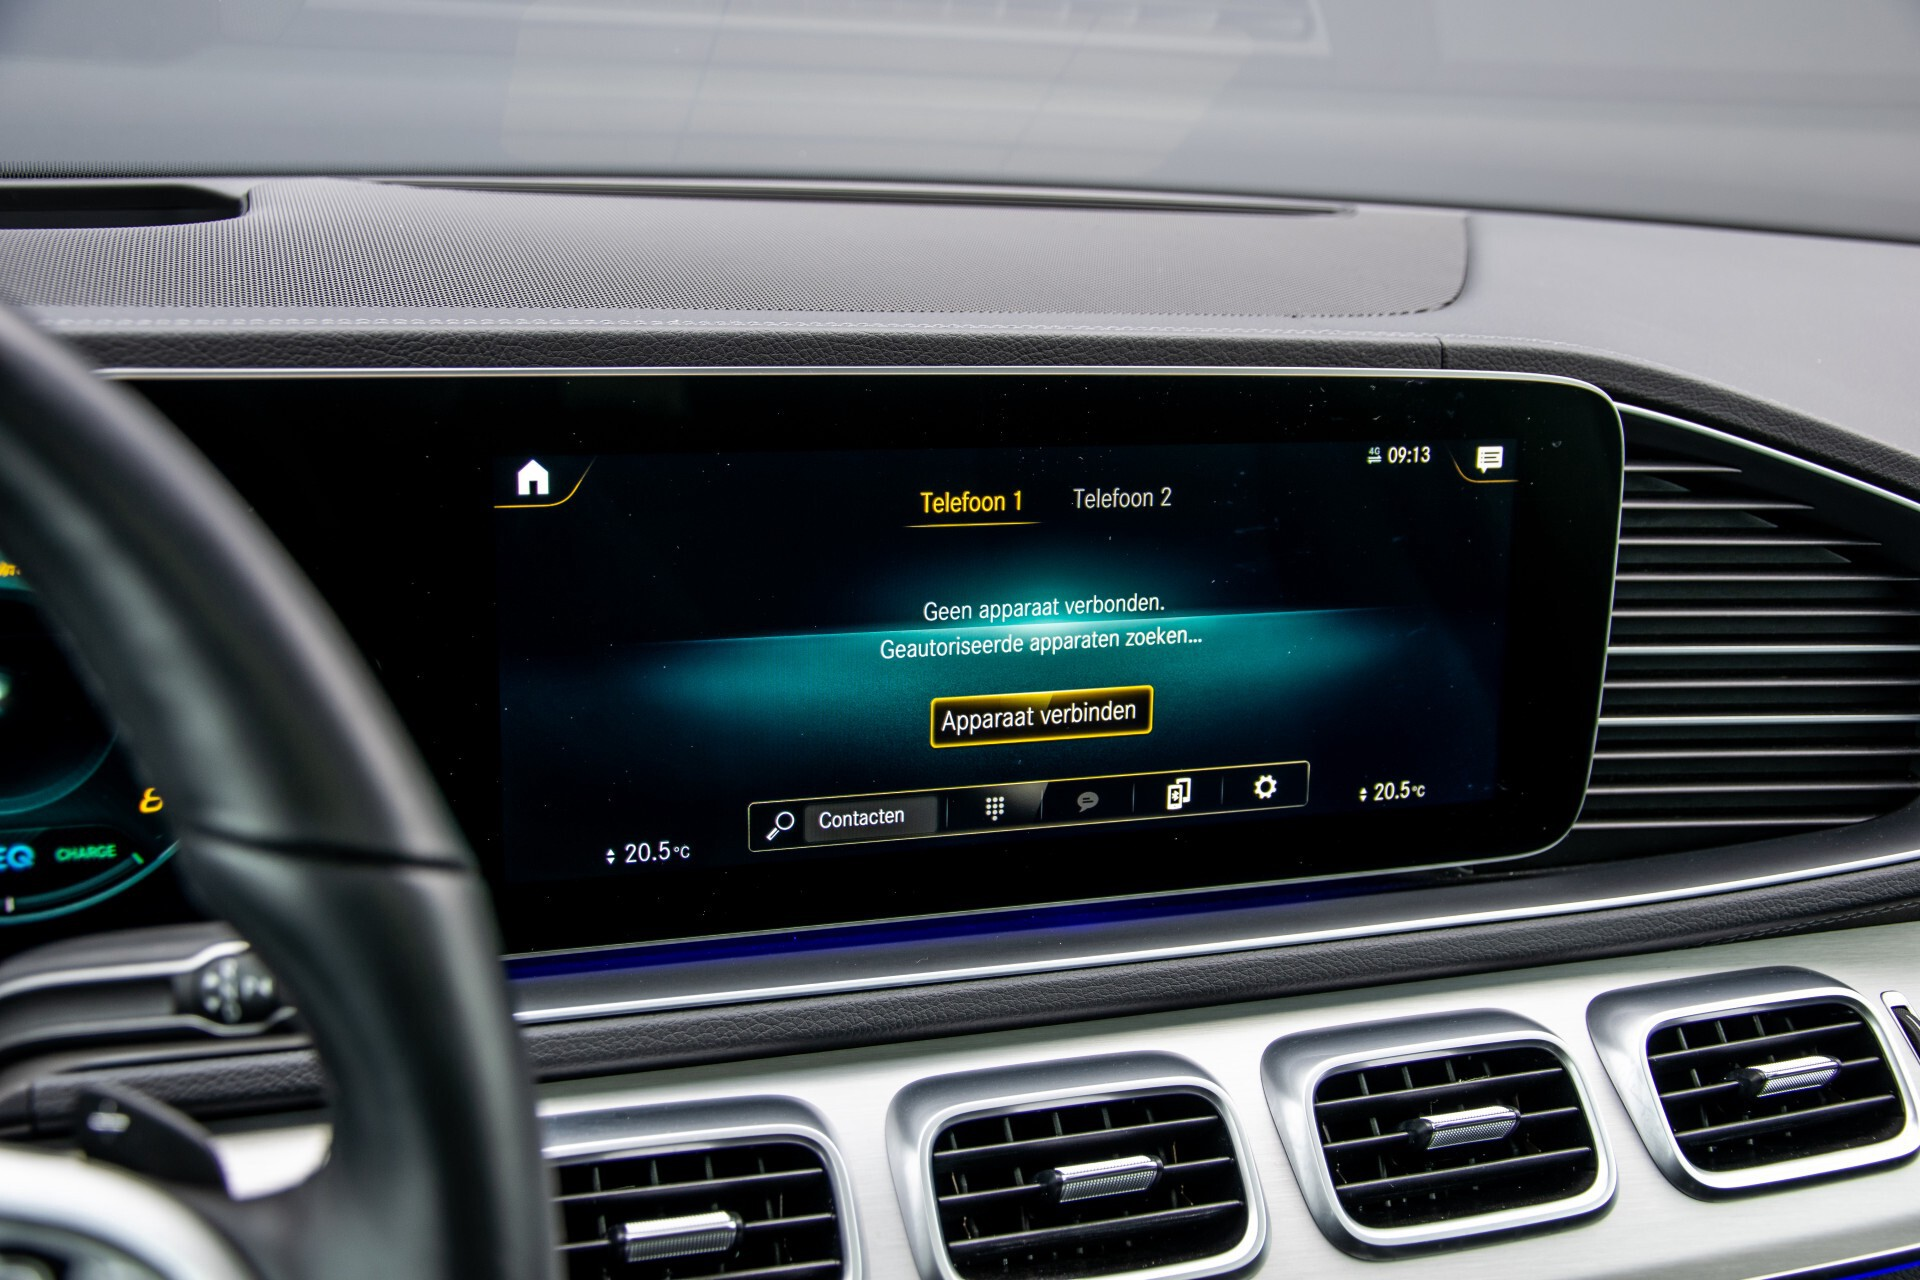 Mercedes-Benz GLE 450 4-M 7-Persoons AMG Massage/Rij-assist/Keyless/TV/360/Night/Trekhaak Aut9 Foto 24